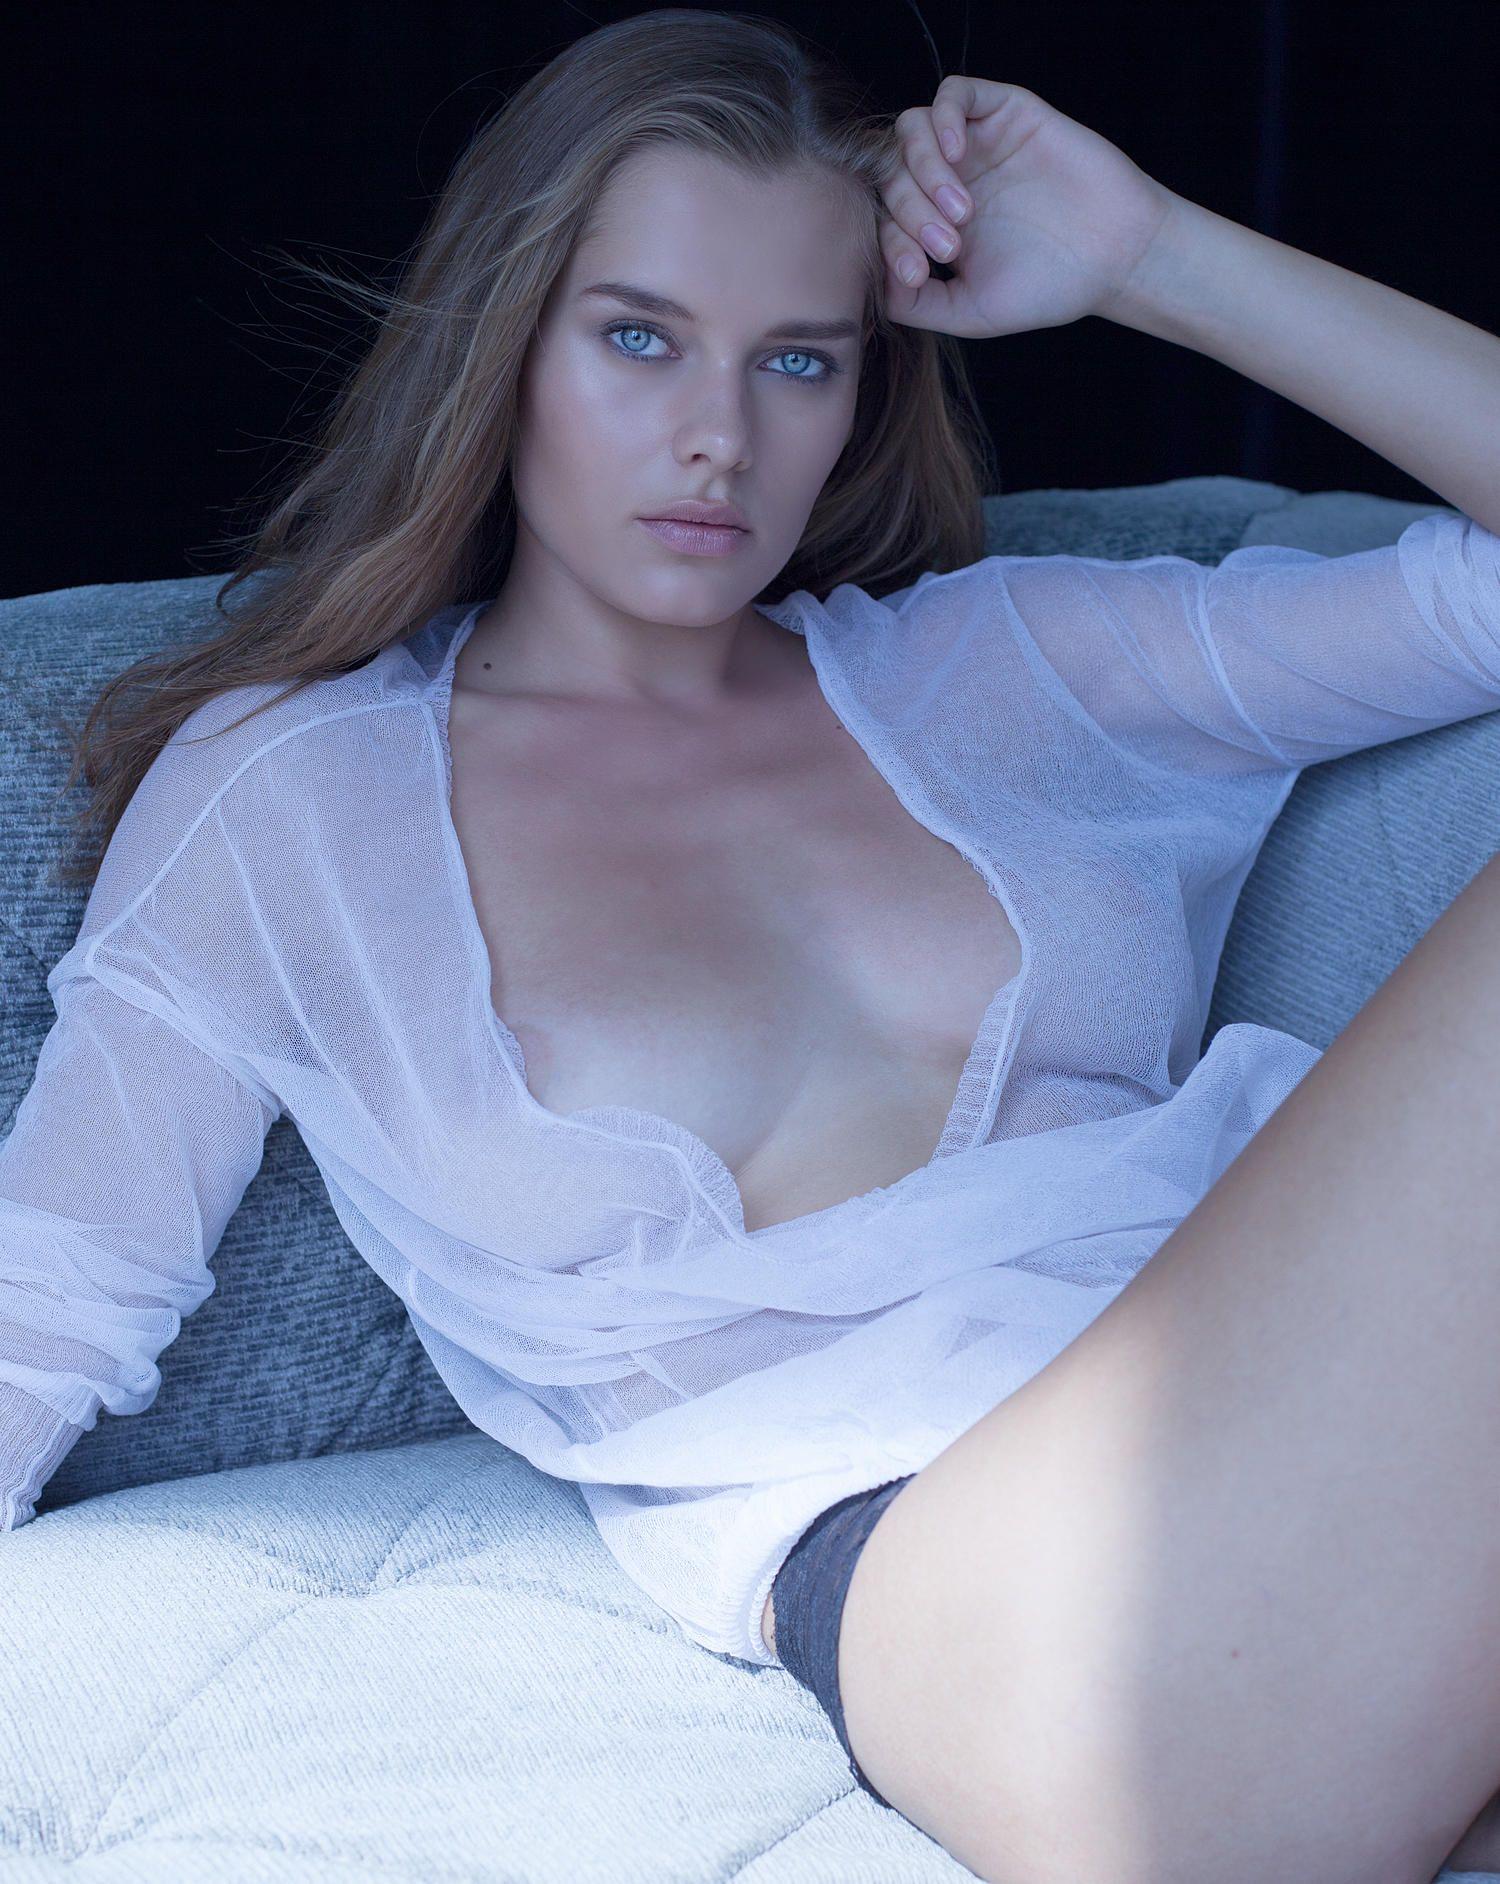 Inez Busty Great si model solveig mork hansen topless danish perfection - egotastic